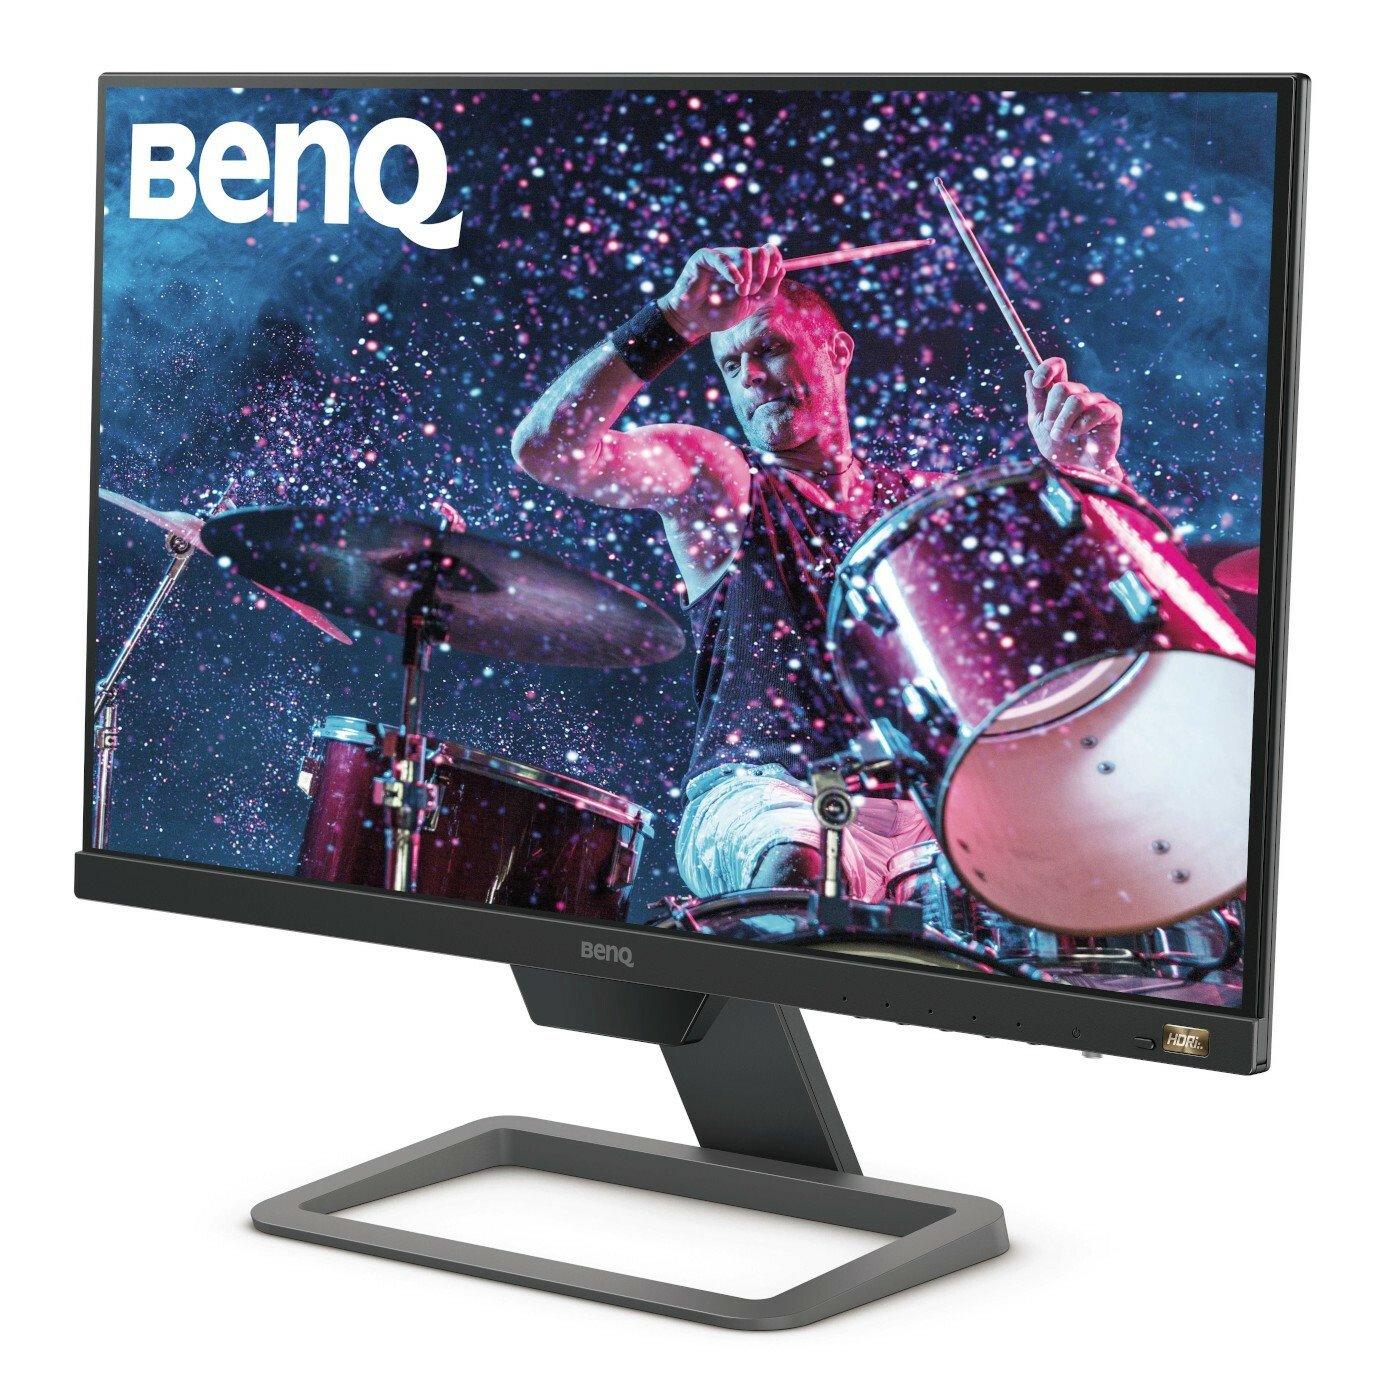 "BenQ EW2480 60.5 cm (23.8"") Full HD LED Gaming LCD Monitor - 16:9 - Black, Metallic Grey"